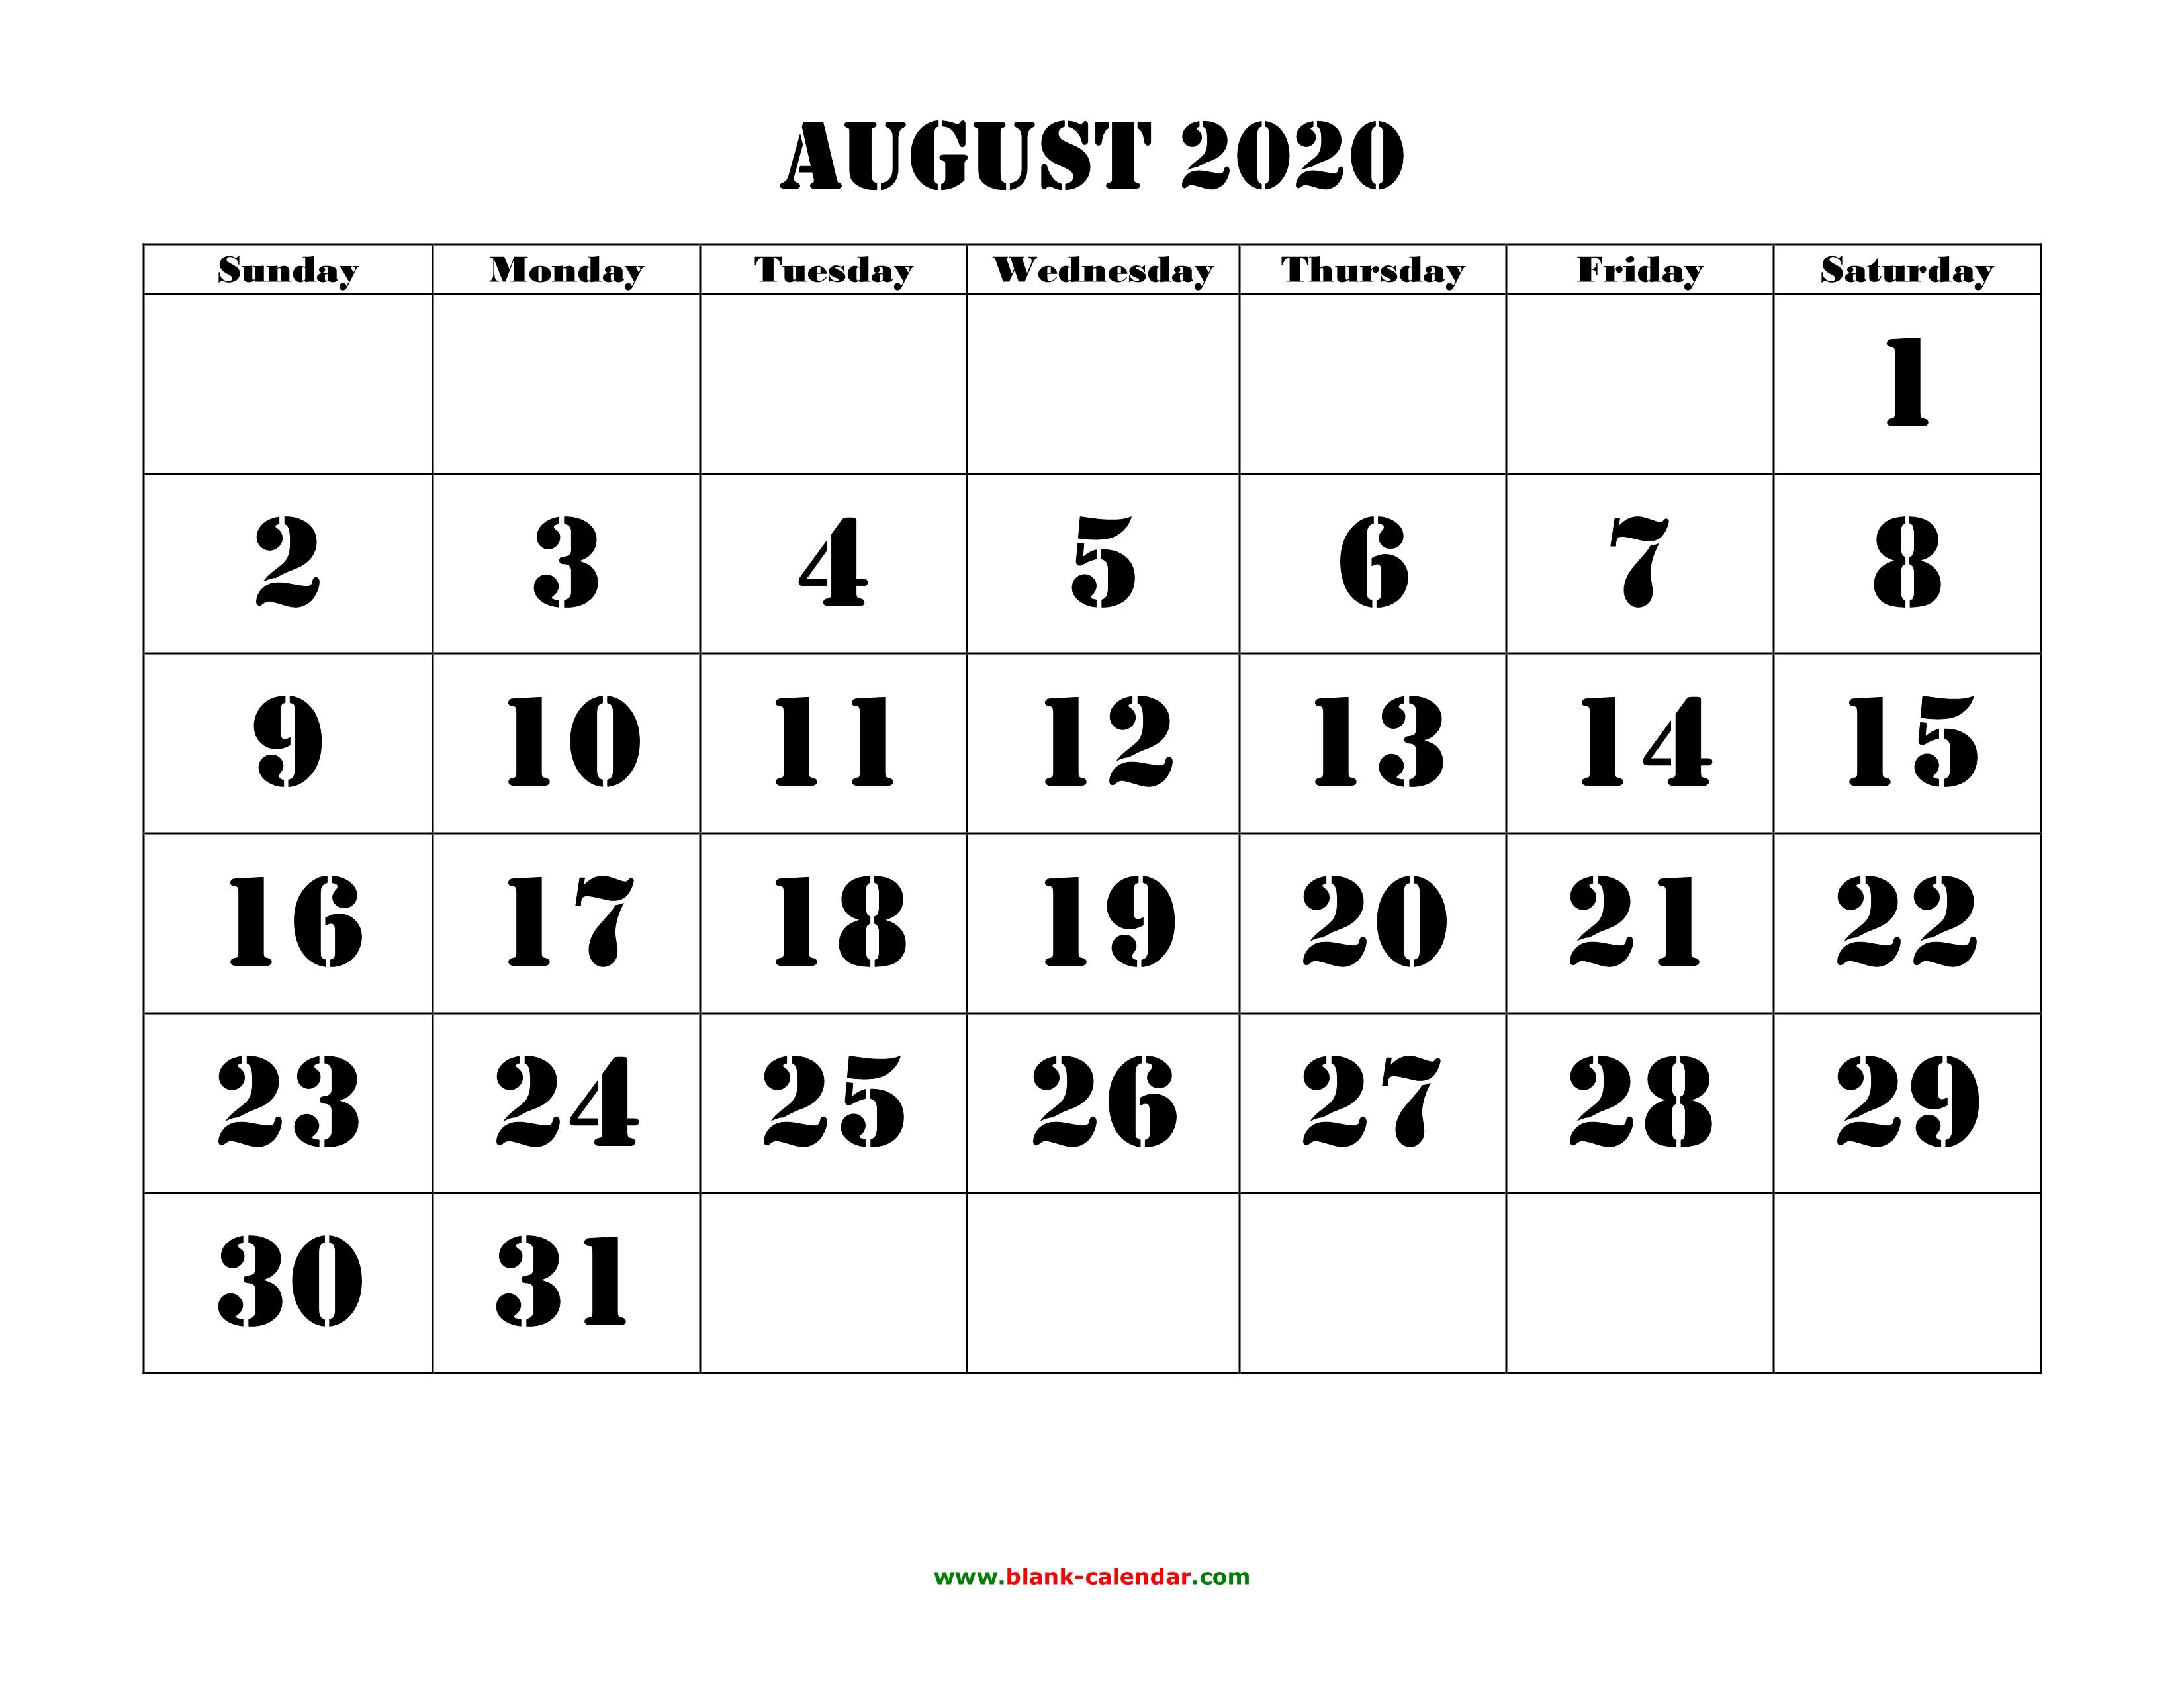 Free Download Printable August 2020 Calendar, Large Font Design inside Kid Freiendly August 2020 Calendars